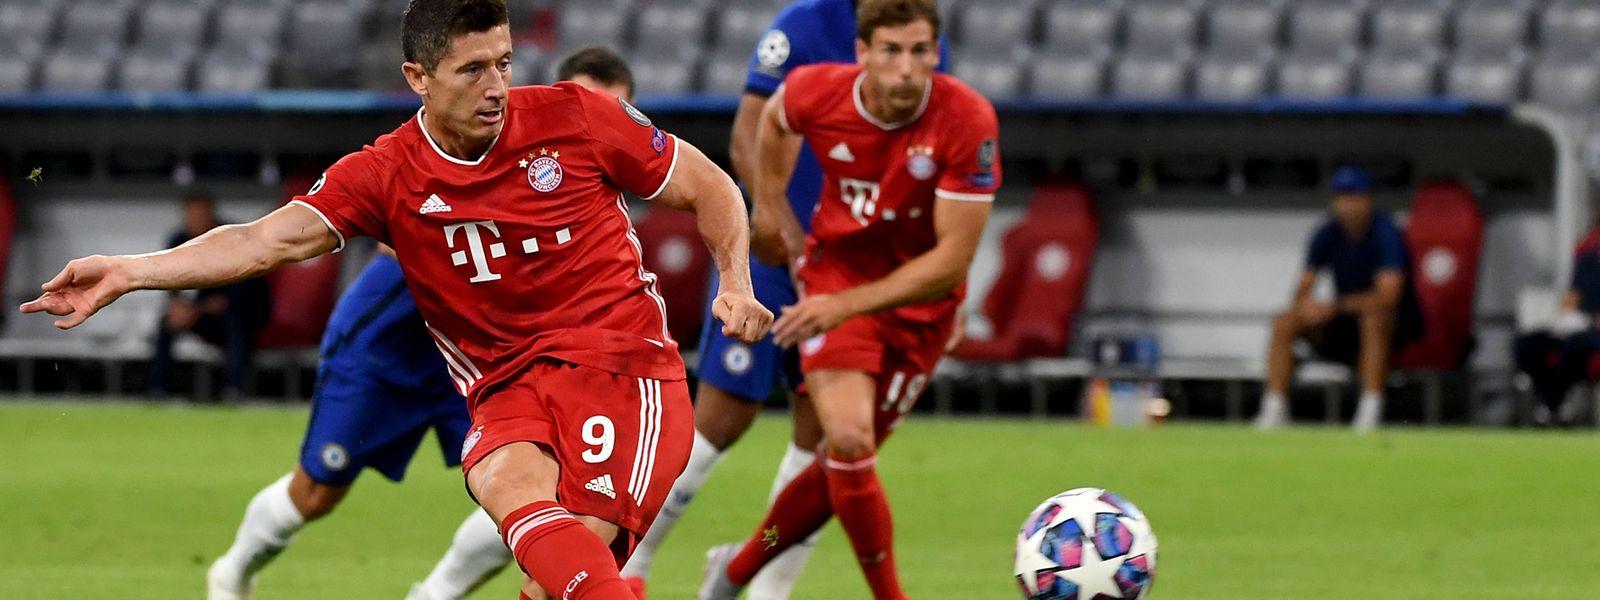 Robert Lewandowski erzielt erneut zwei Tore für den FC Bayern.